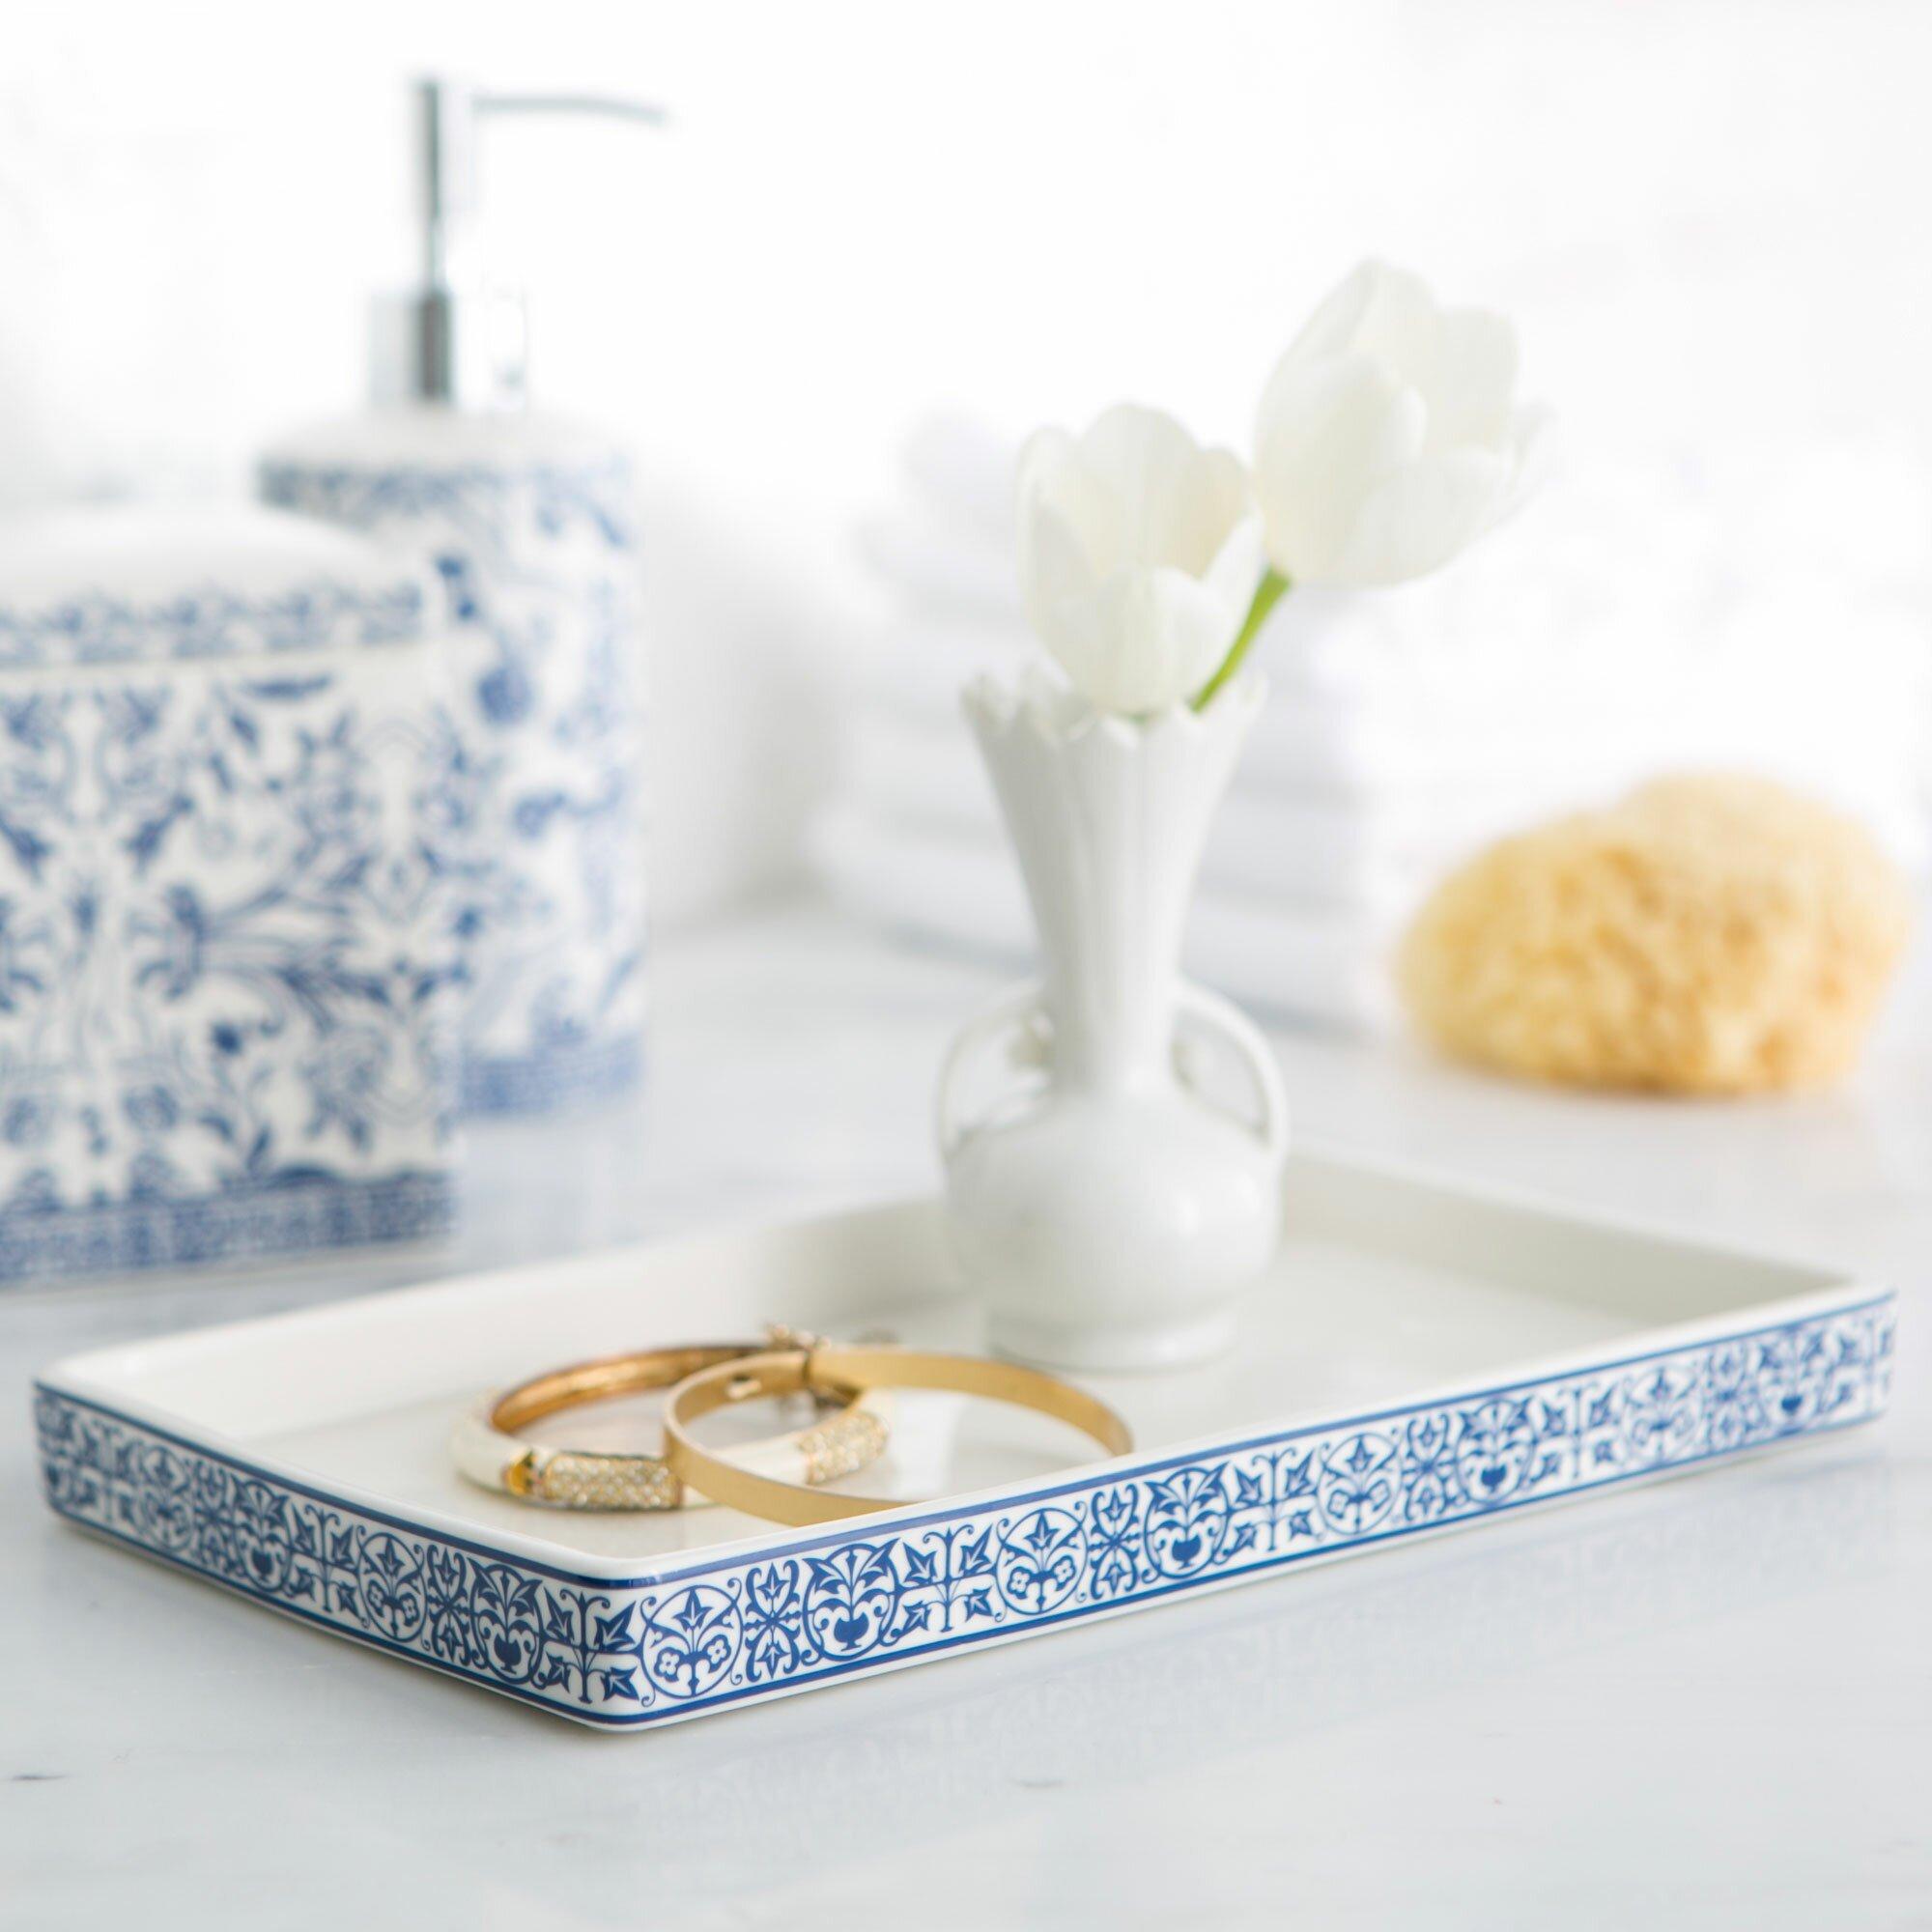 Birch lane porcelain bathroom accessory tray reviews wayfair - Find porcelain accessory authentic ...